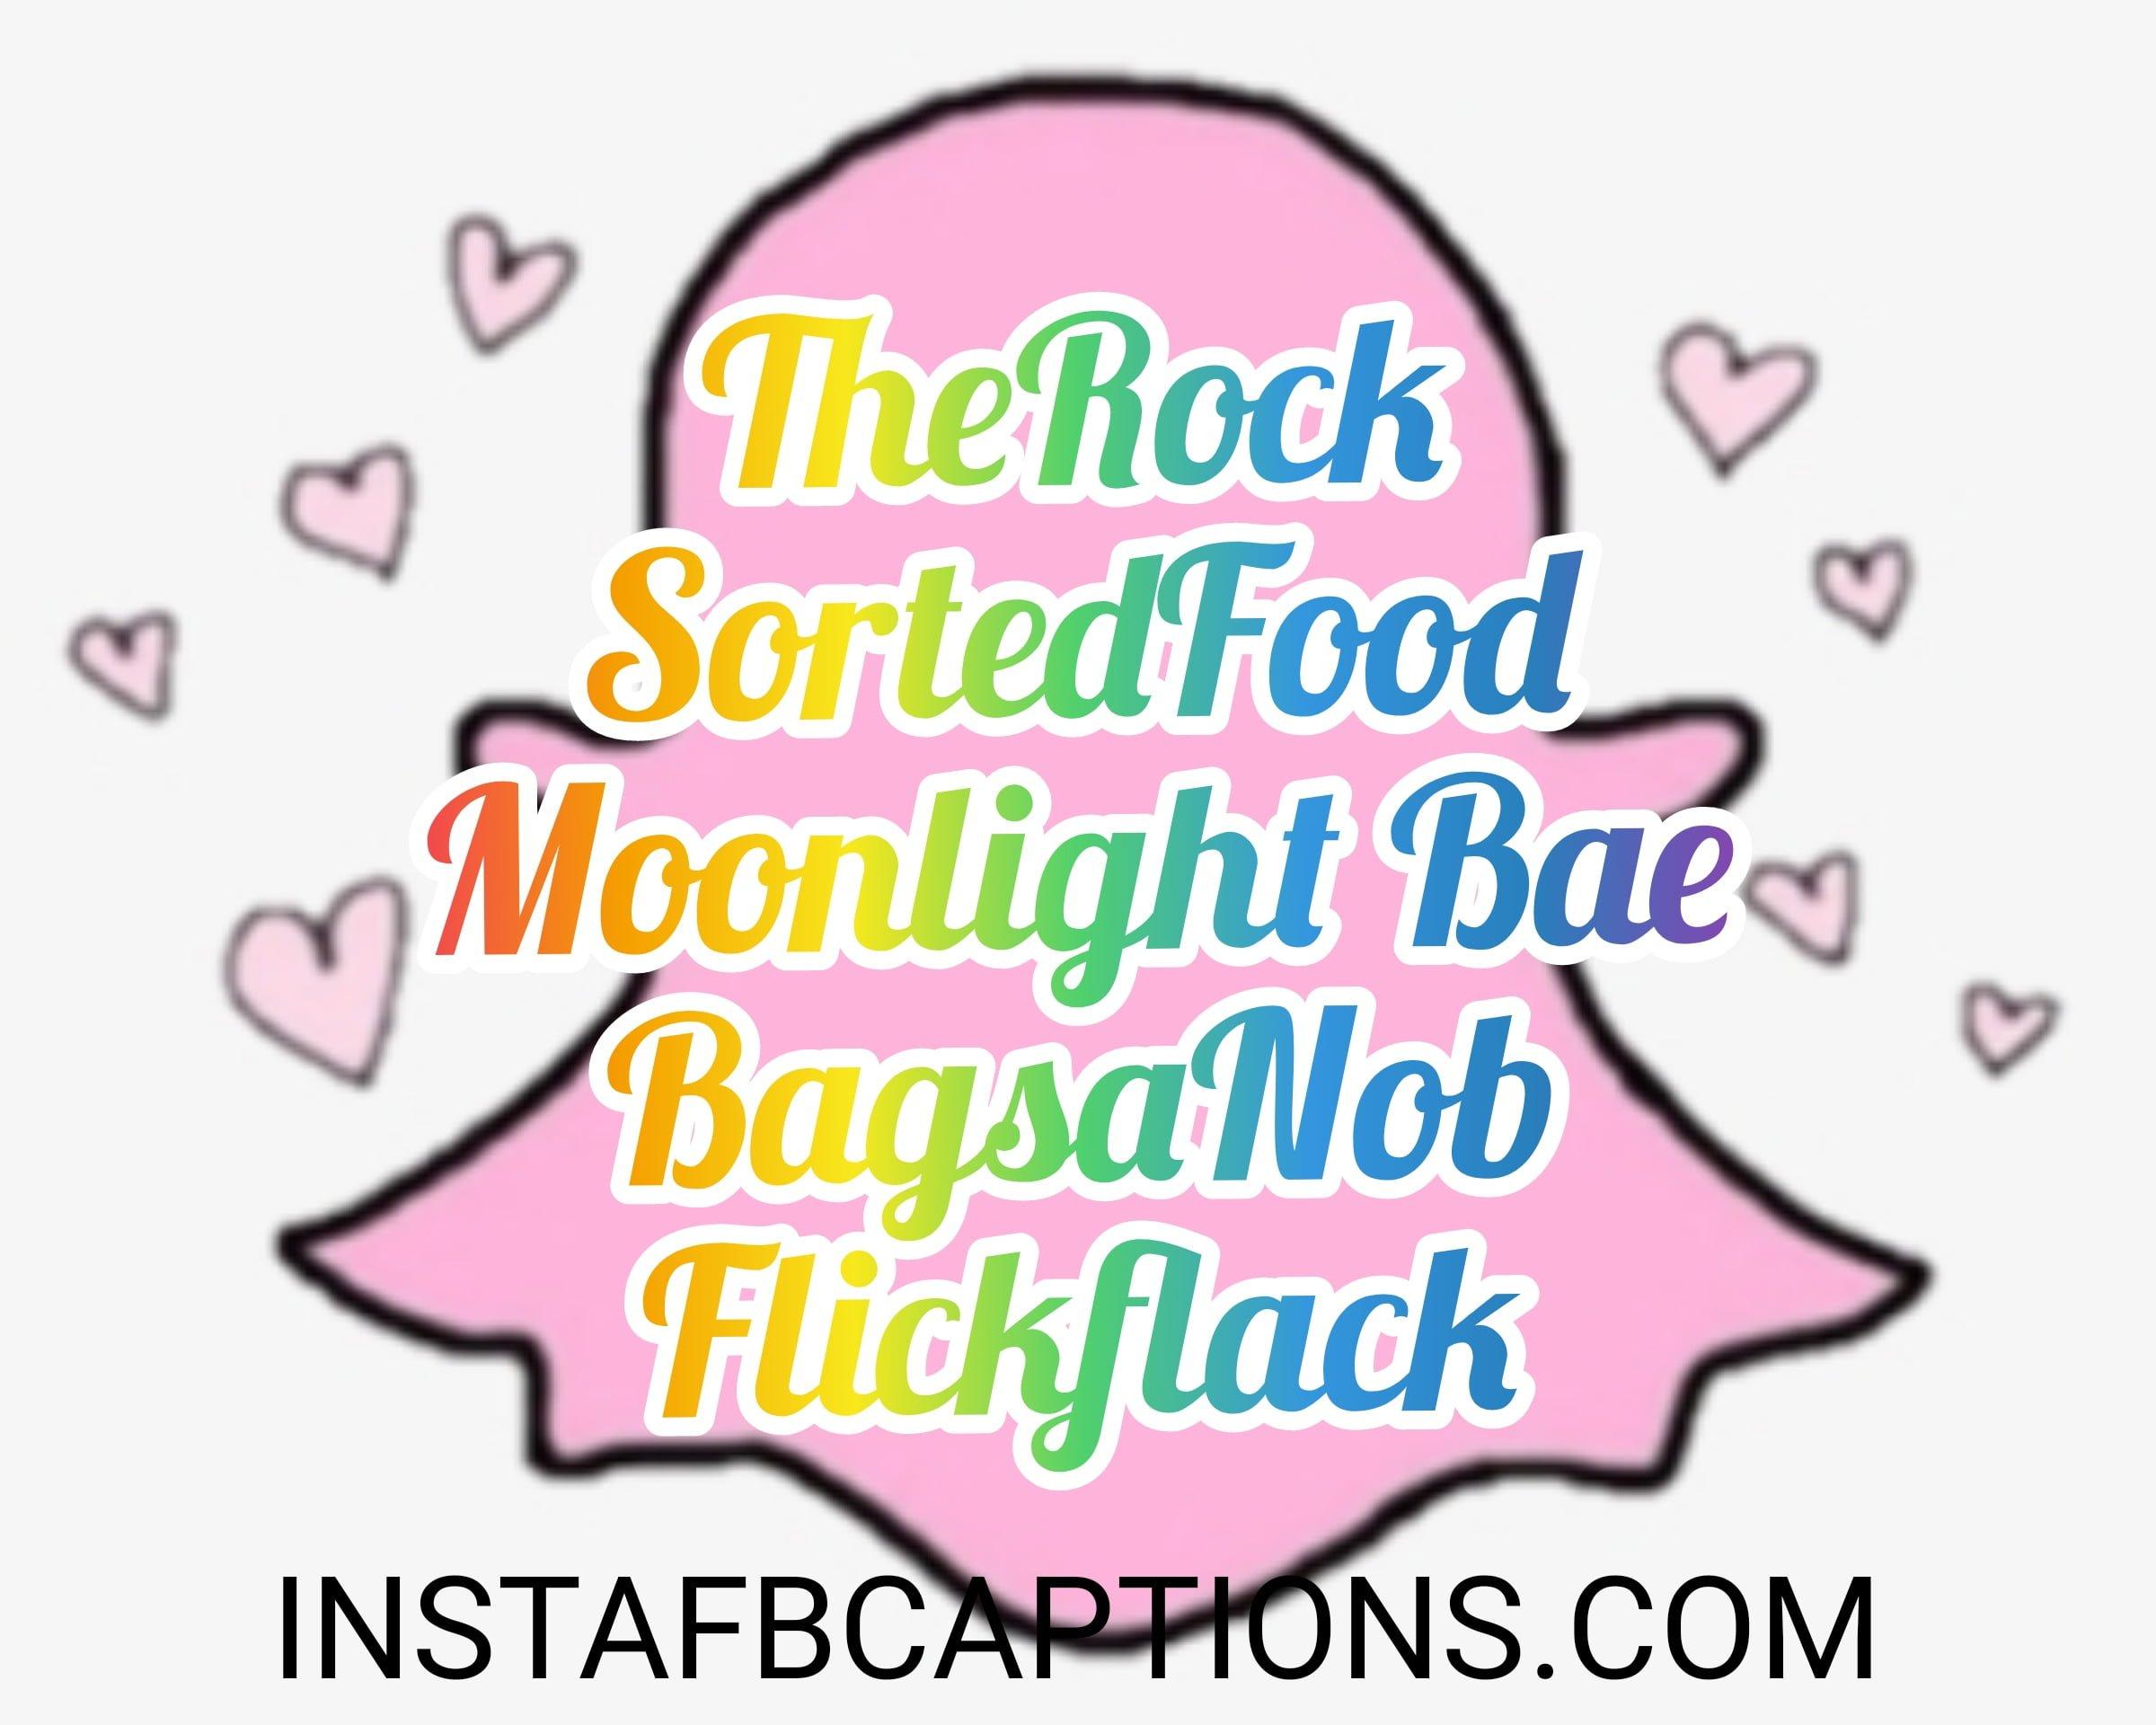 Snapchat Names To Add  - Snapchat names to add - 750+ Best SNAPCHAT NAME IDEAS for Guys & Girls 2021